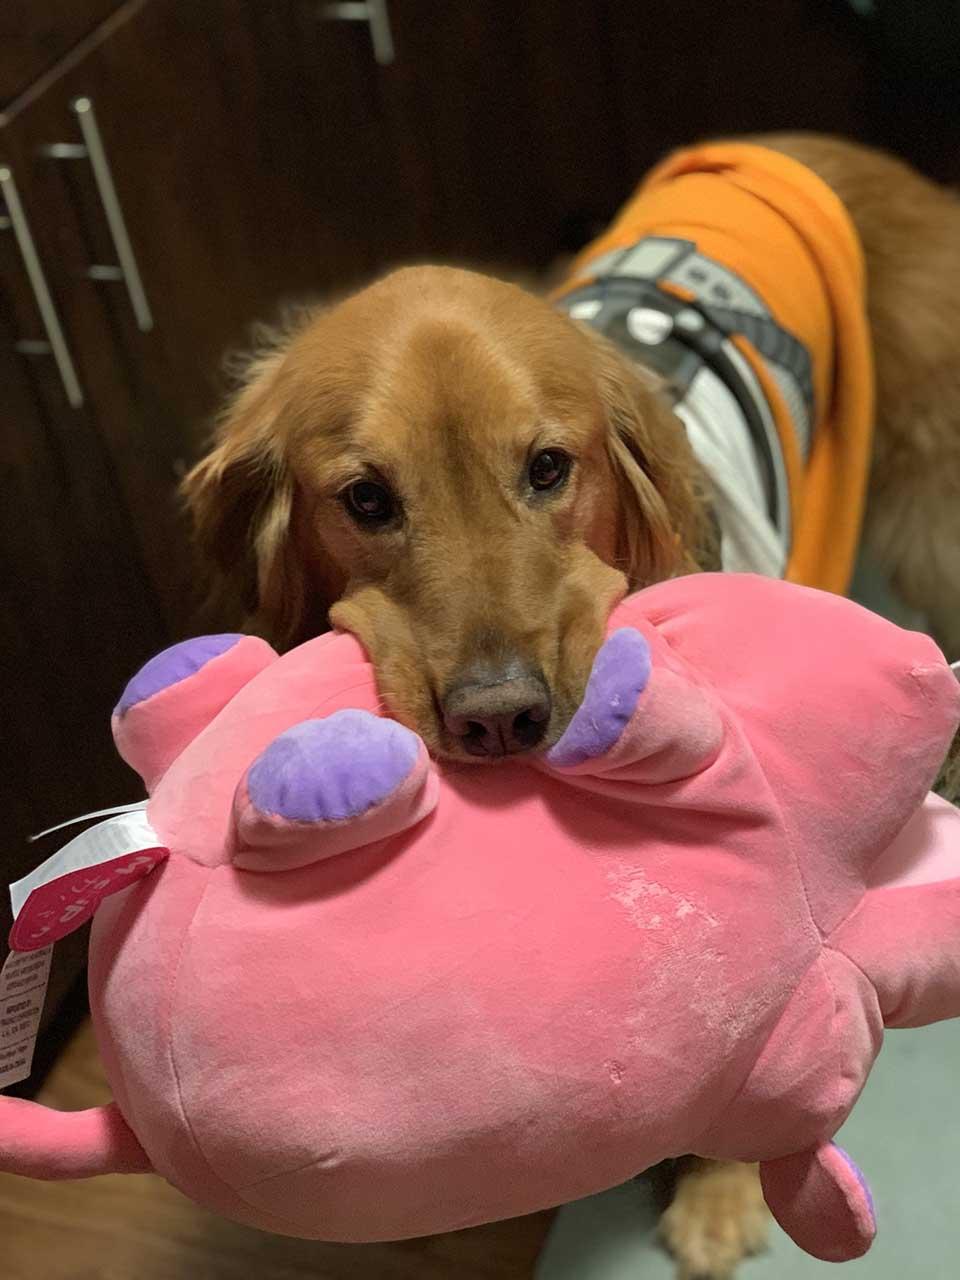 Dulce perro y peluche